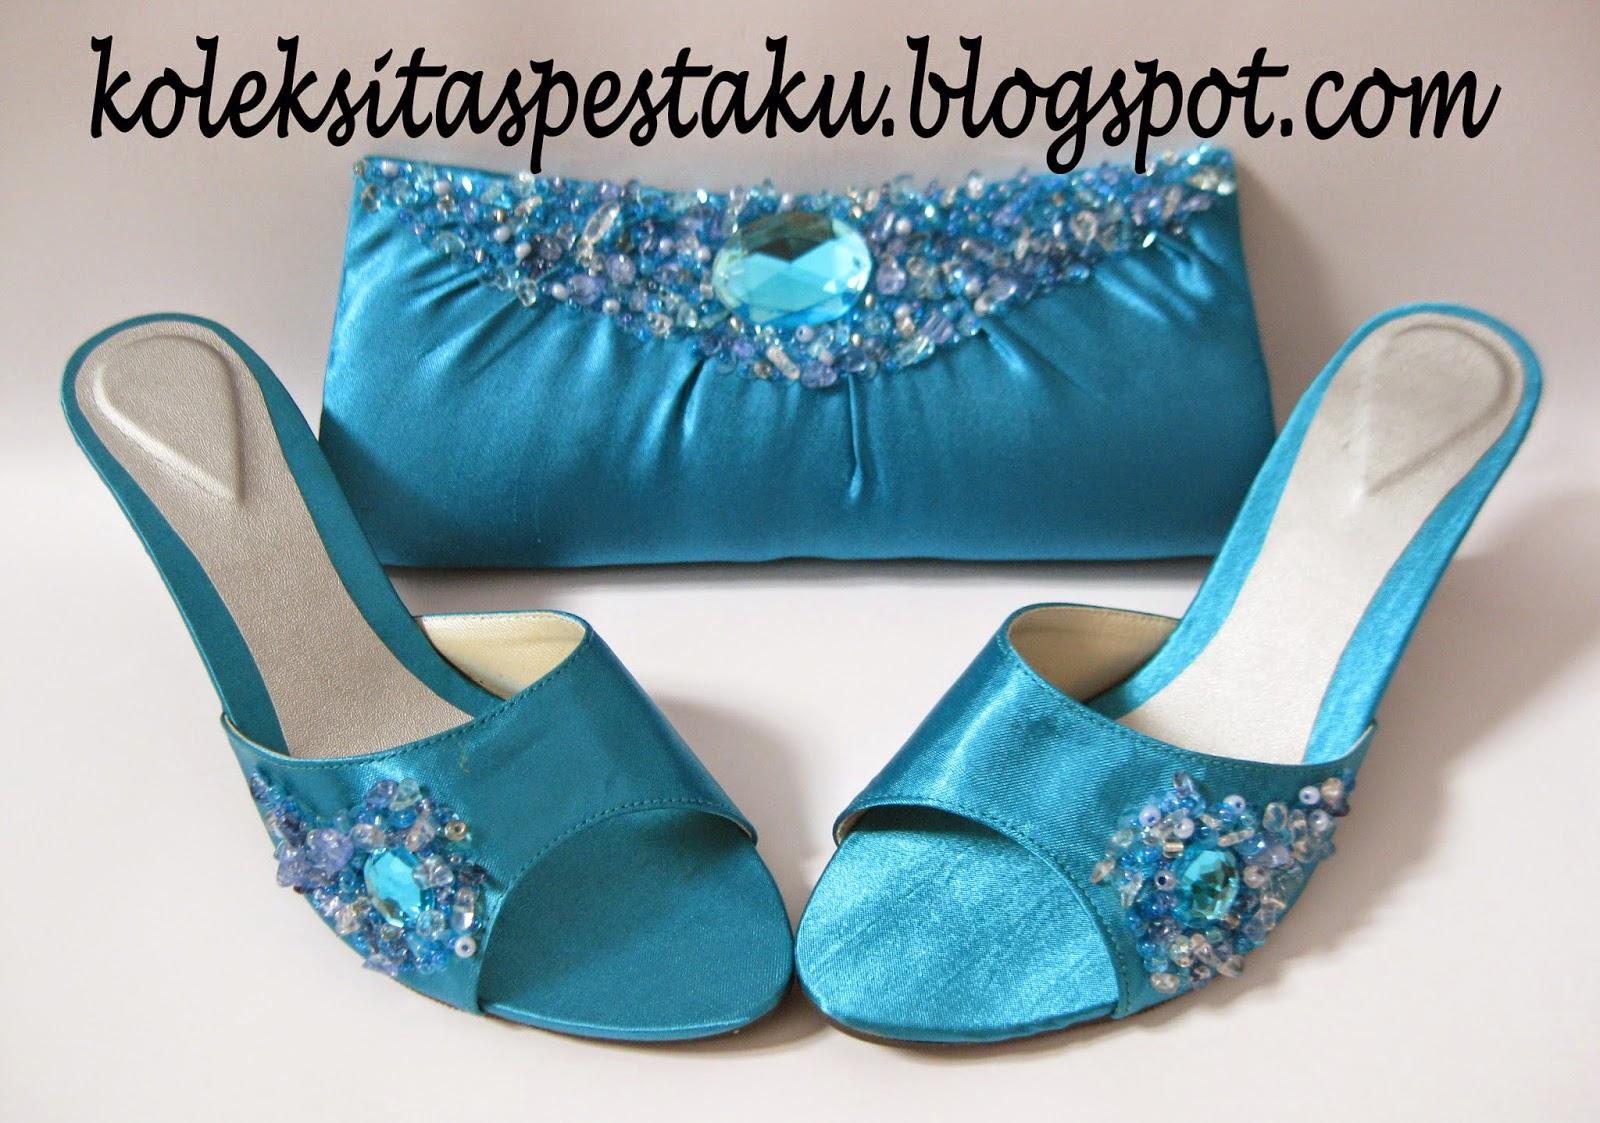 Biru Tosca Tas Pesta Mewah Sepaket Sepatu High Heels Elegant dan Cantik Awet